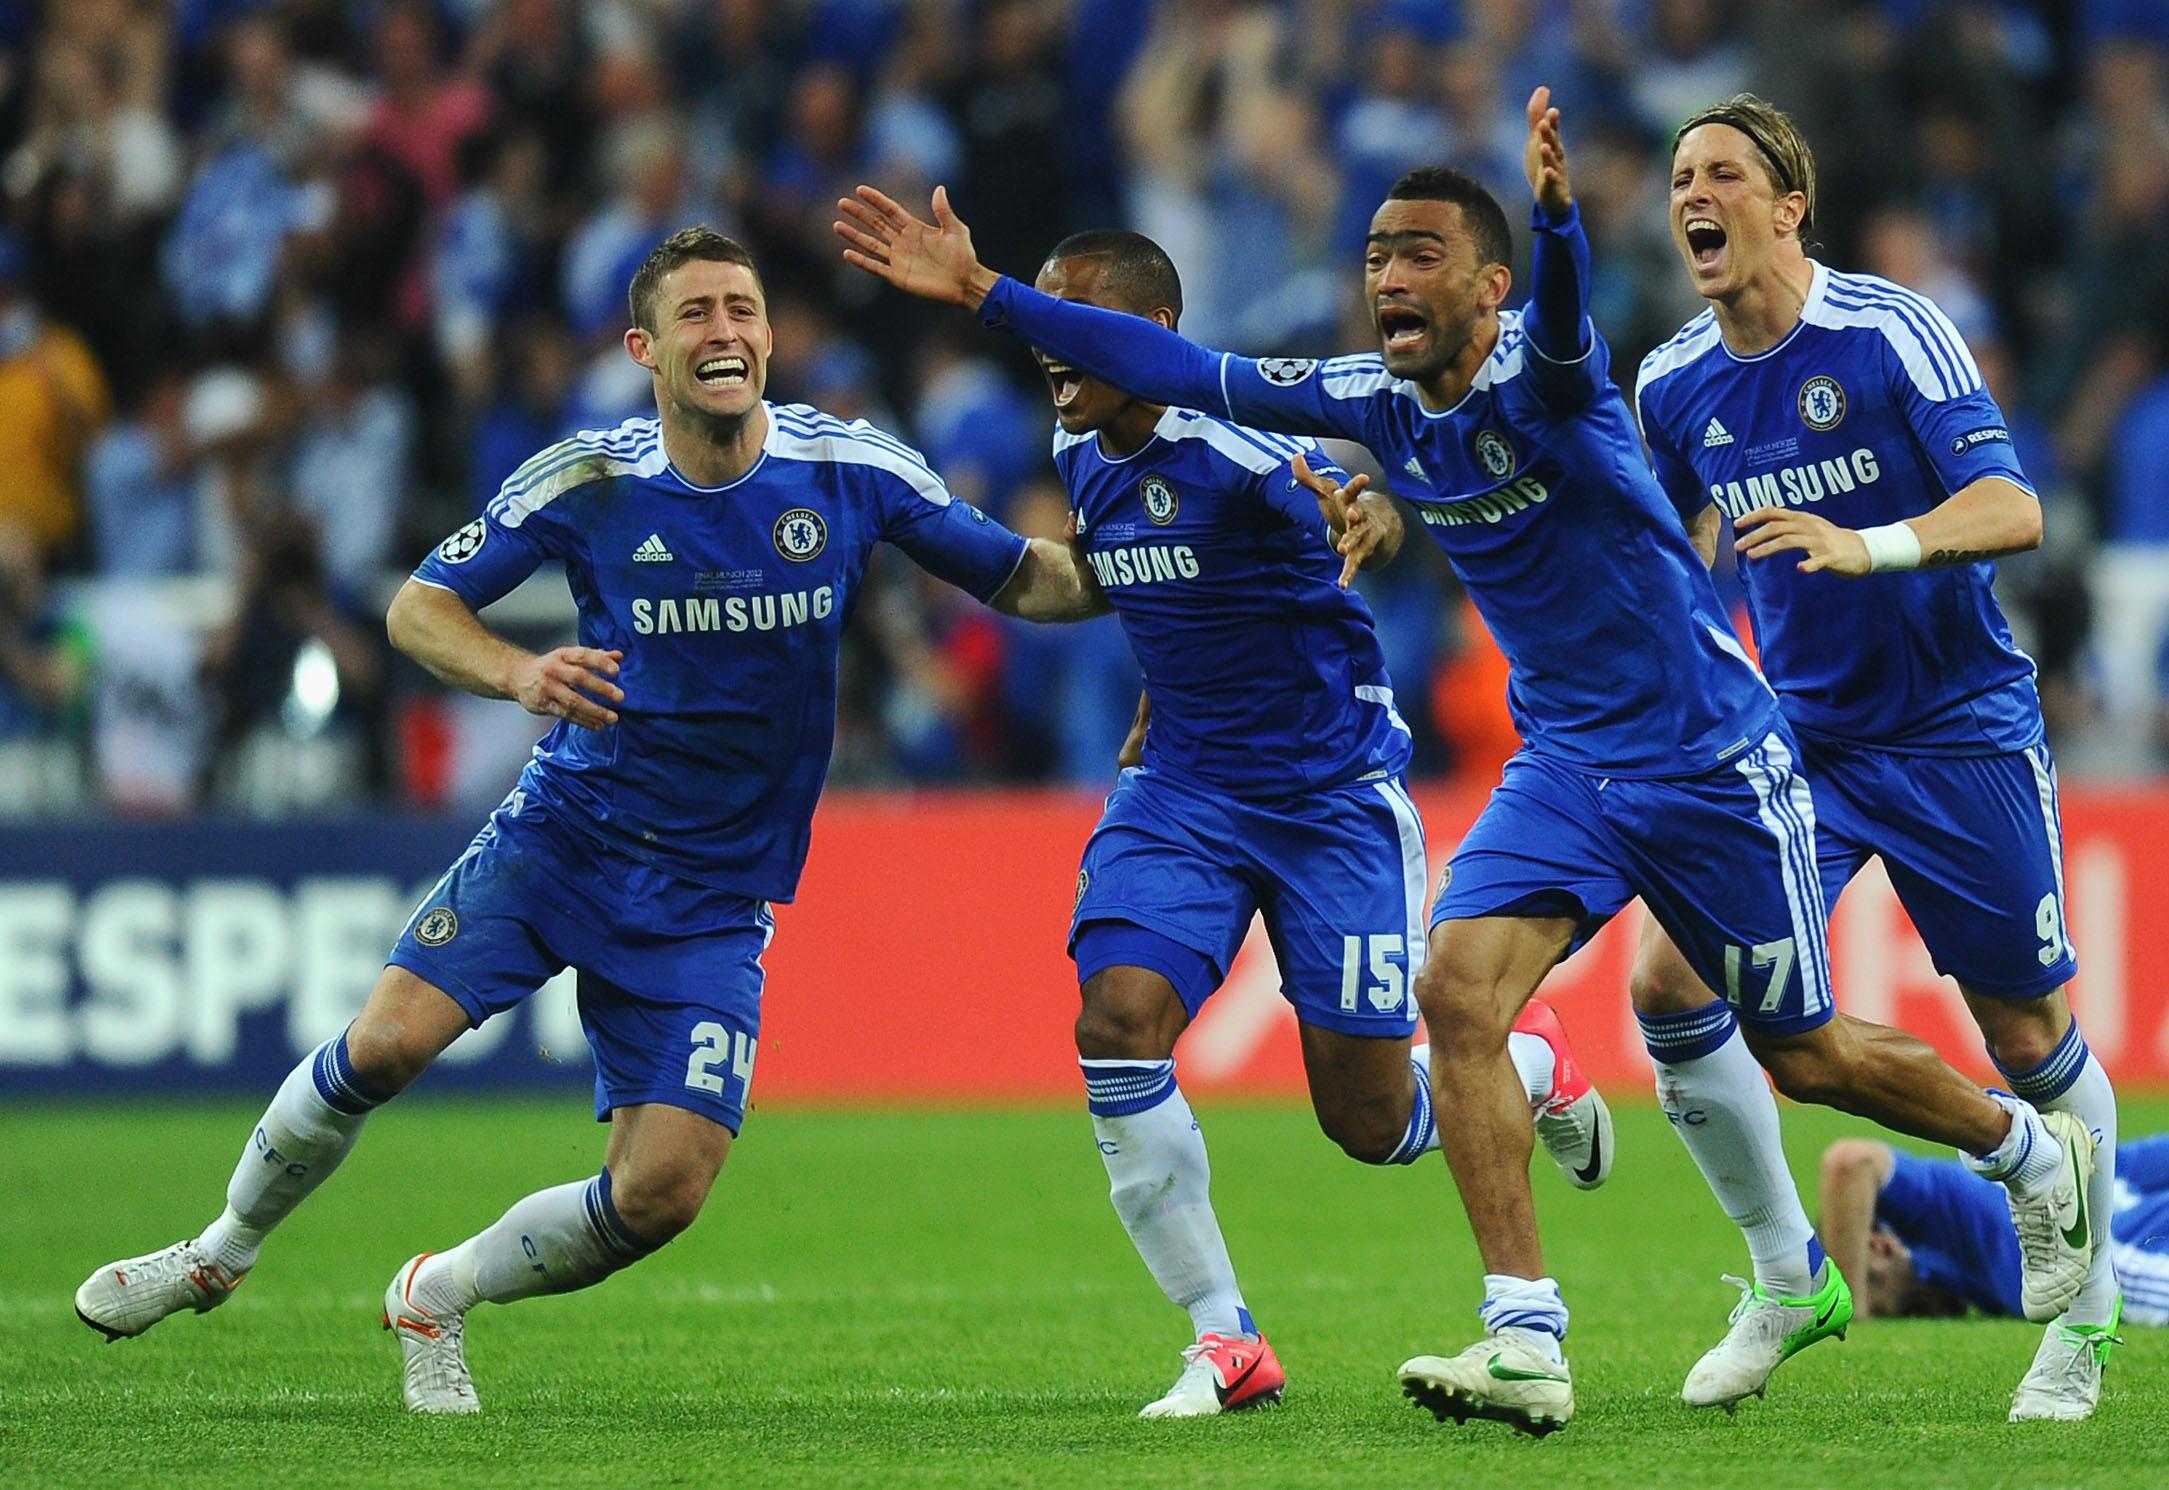 CHELSEA WINS THE UEFA CHAMPIONS LEAGUE 2012 - Scoop Empire